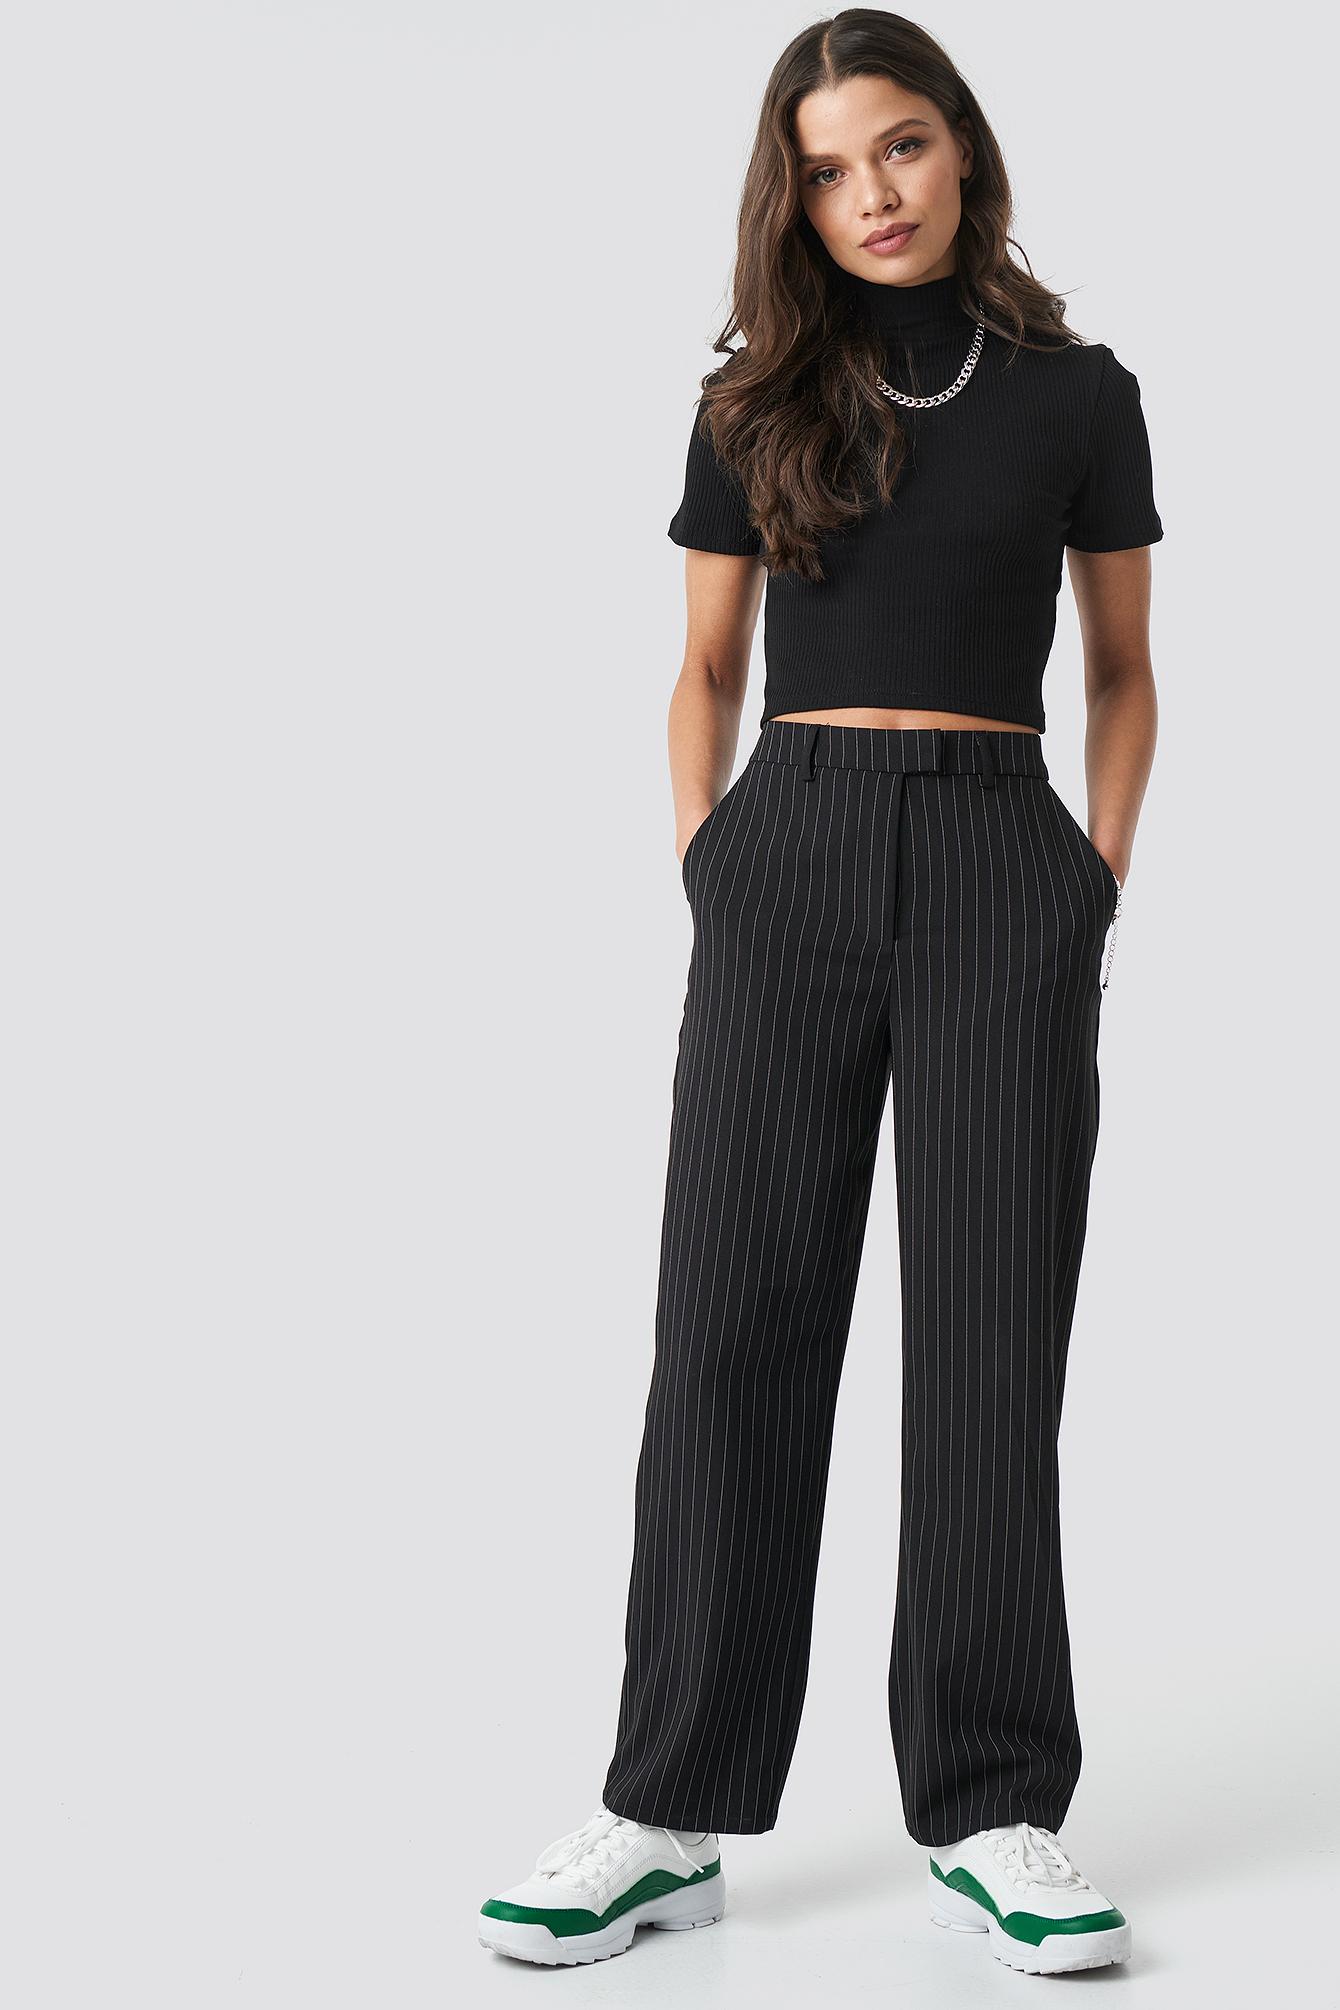 astrid olsen x na-kd -  Pinstripe Pants - Black